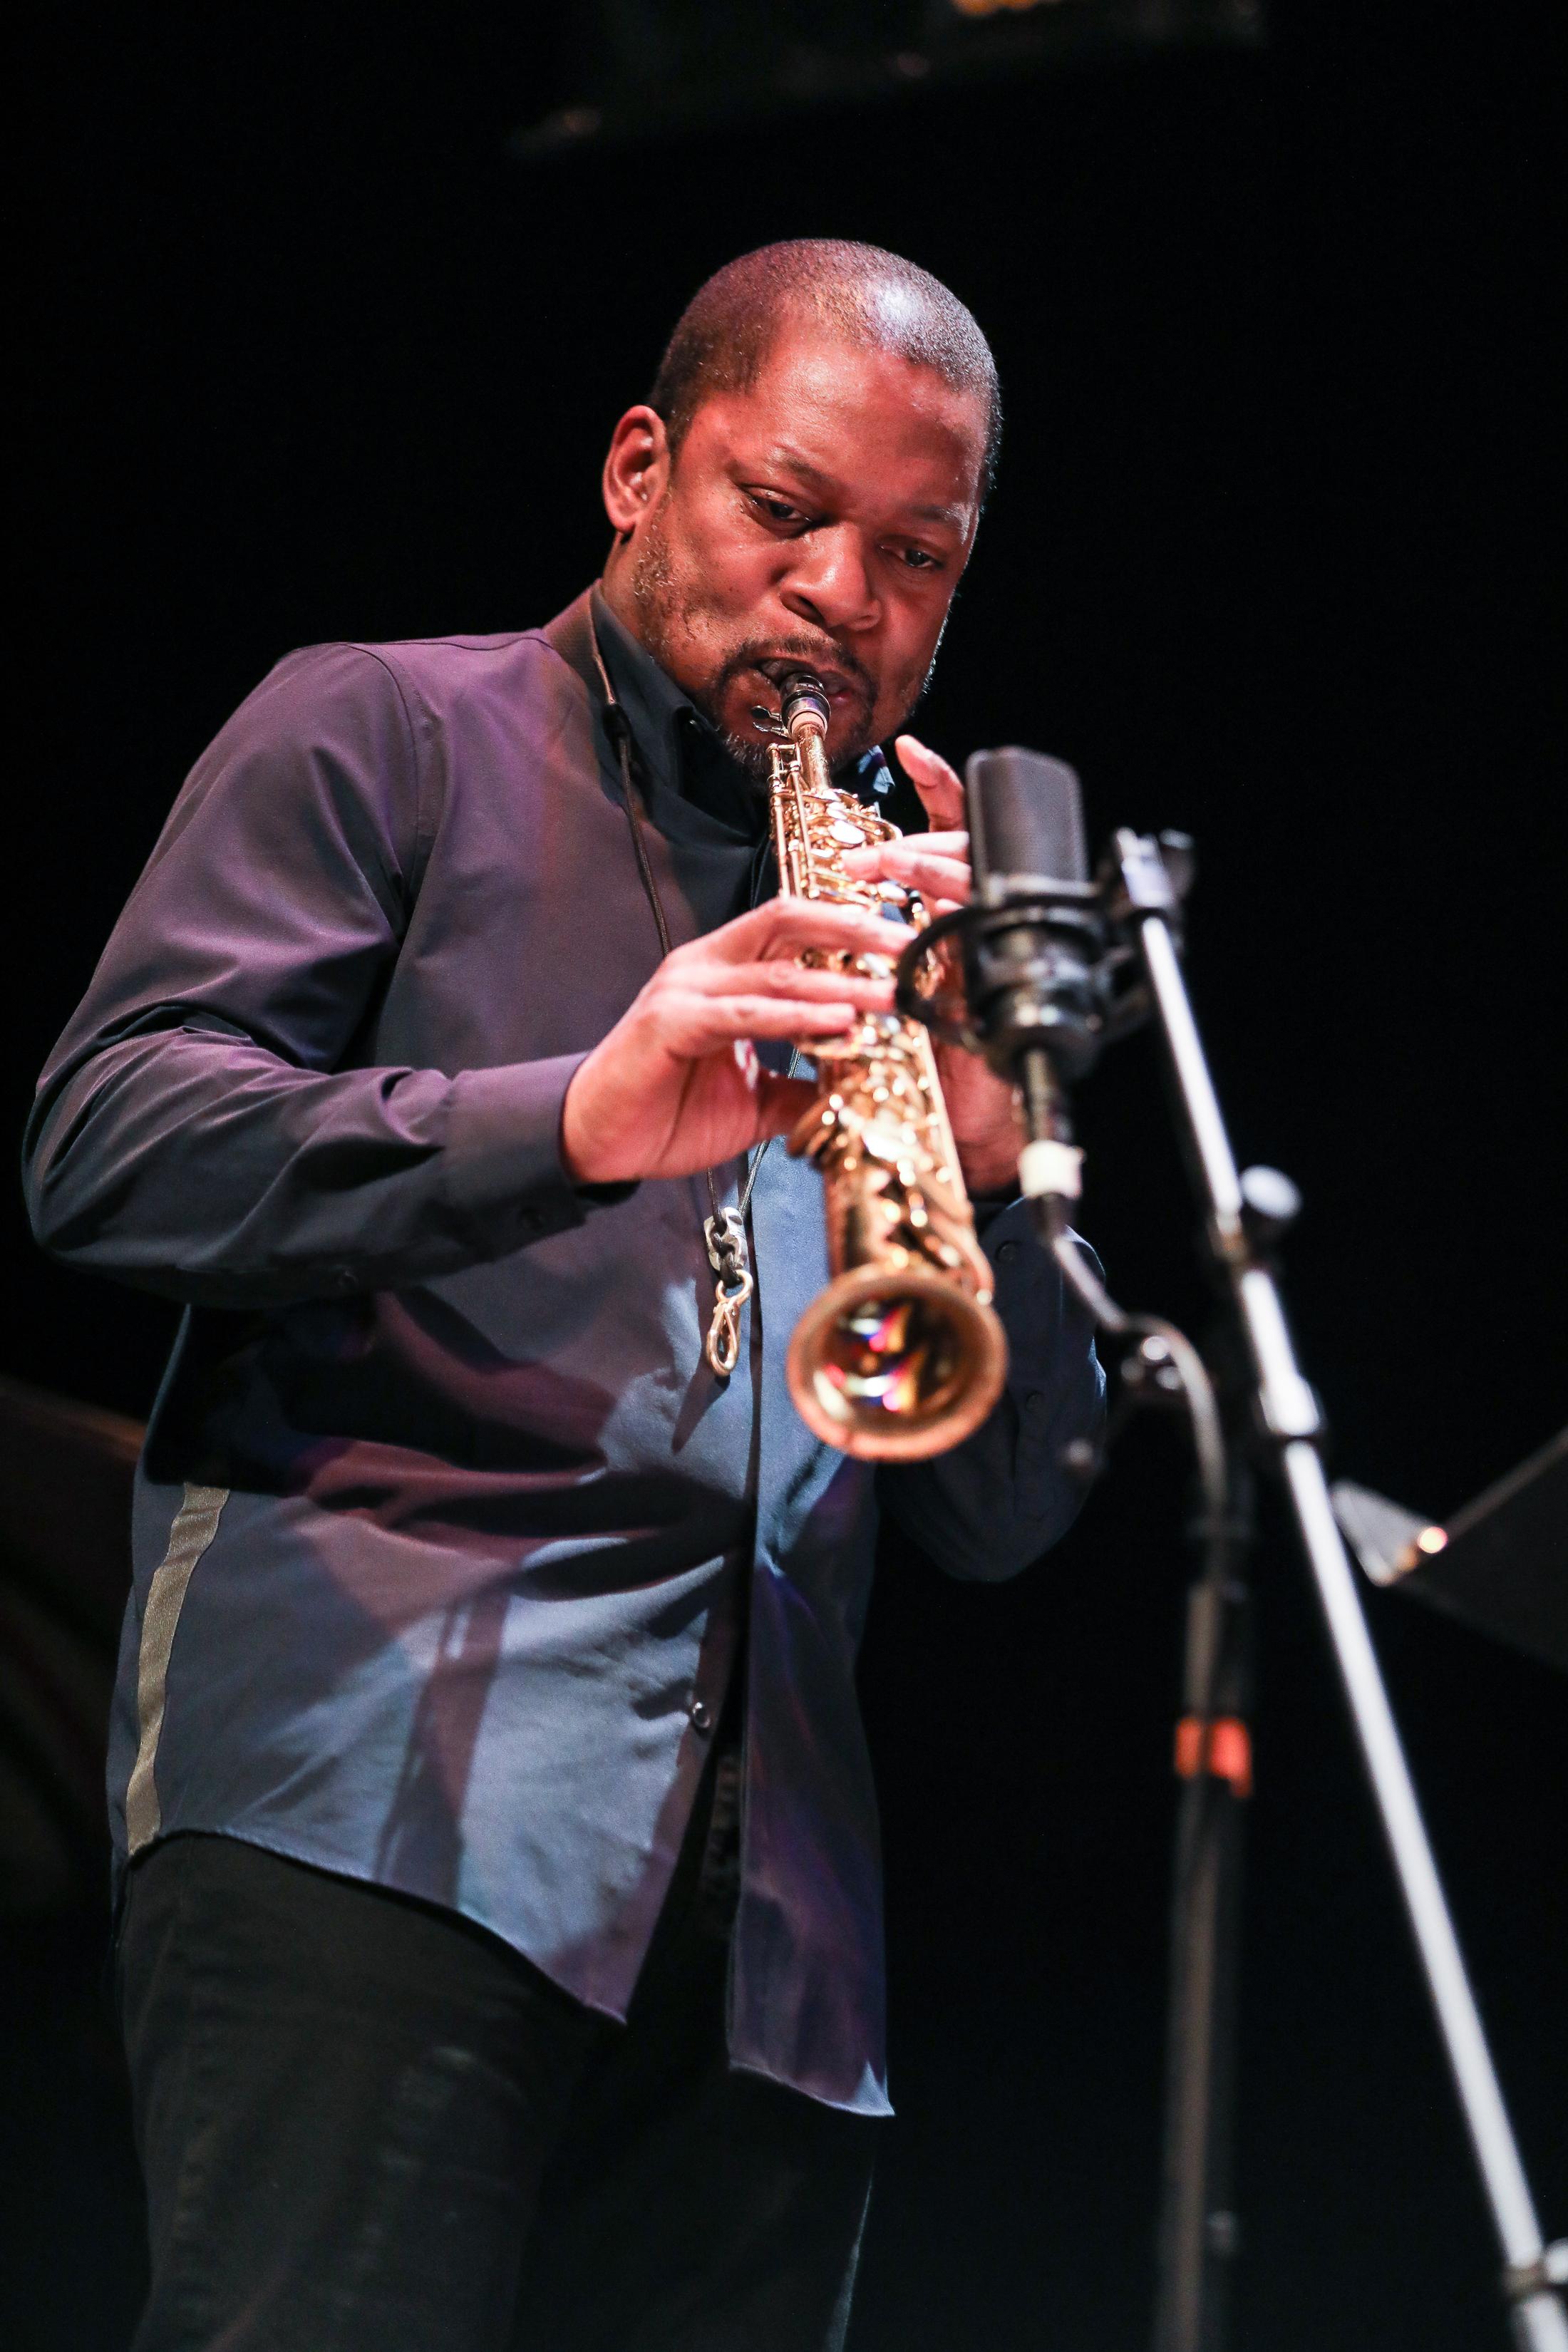 Ravi Coltrane performing with Esperanza Spalding and Terri Lyne Carrington at the 2018 PDX Jazz Festival (photo by Mark Sheldon)